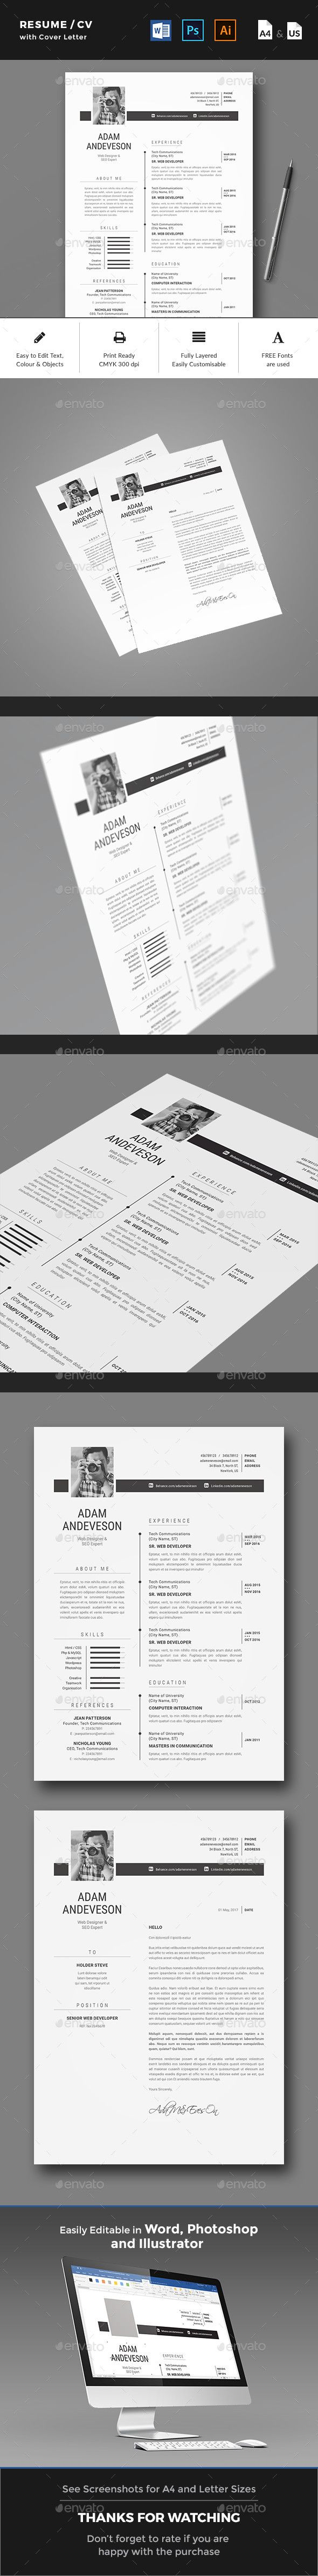 Resume CV 8 best Resume templates